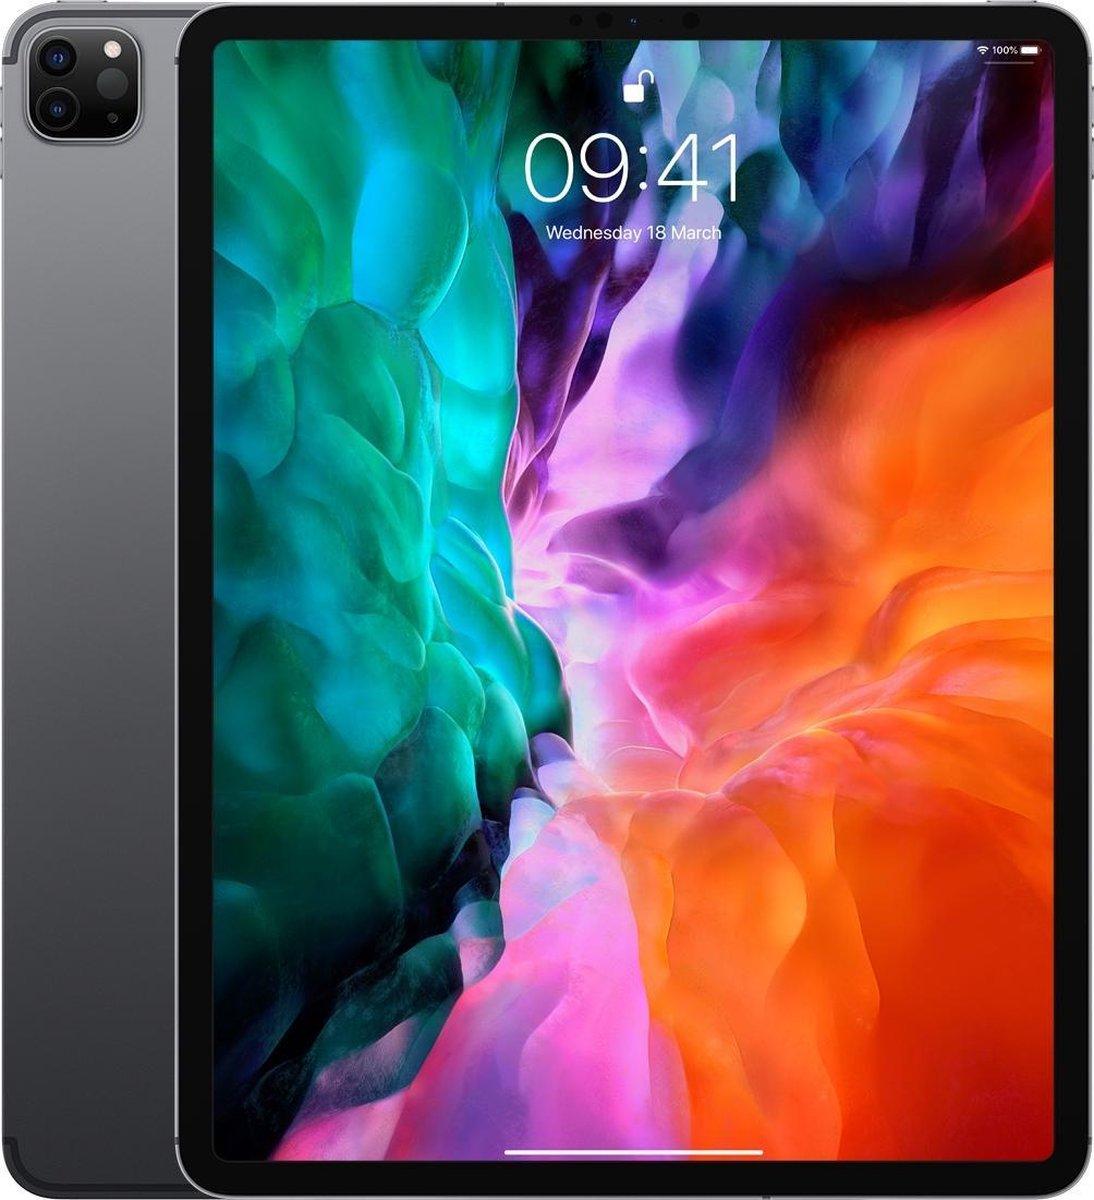 Apple iPad Pro (2020) - 12.9 inch - WiFi + 4G - 128GB - Spacegrijs